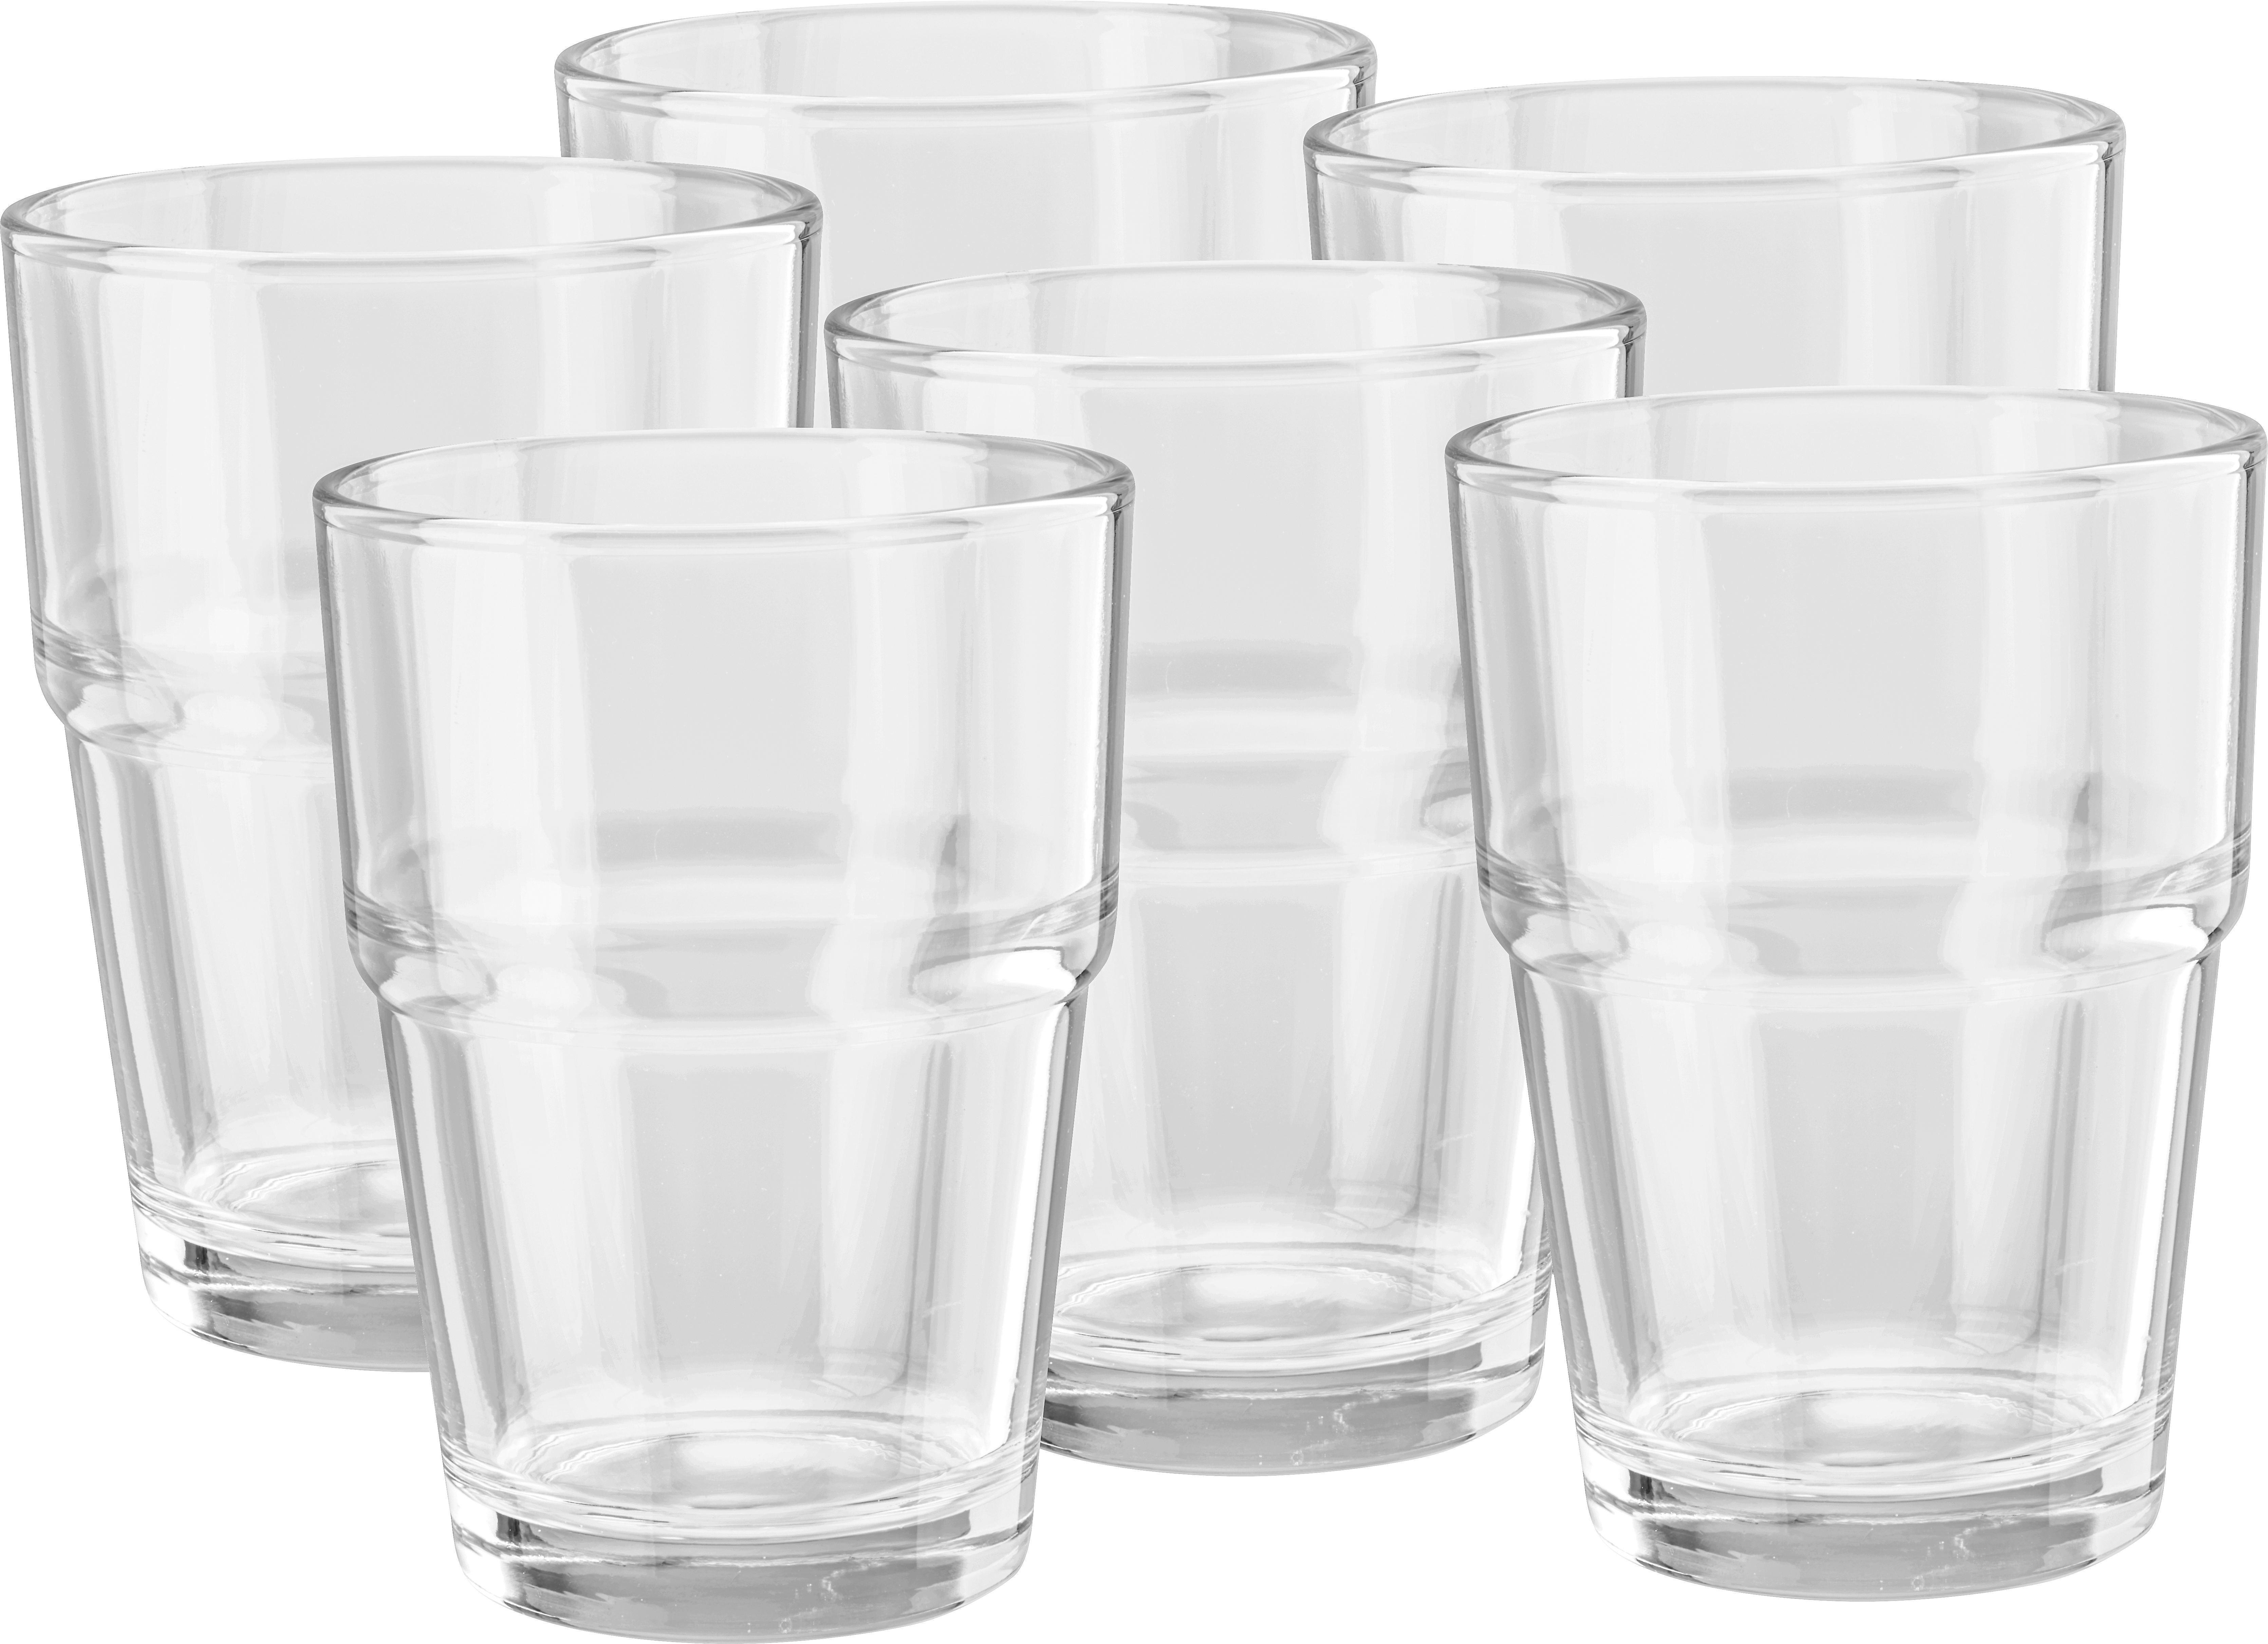 Gläserset Tabitha 6-teilig - Klar, Glas (7,5/10,5cm) - MÖMAX modern living